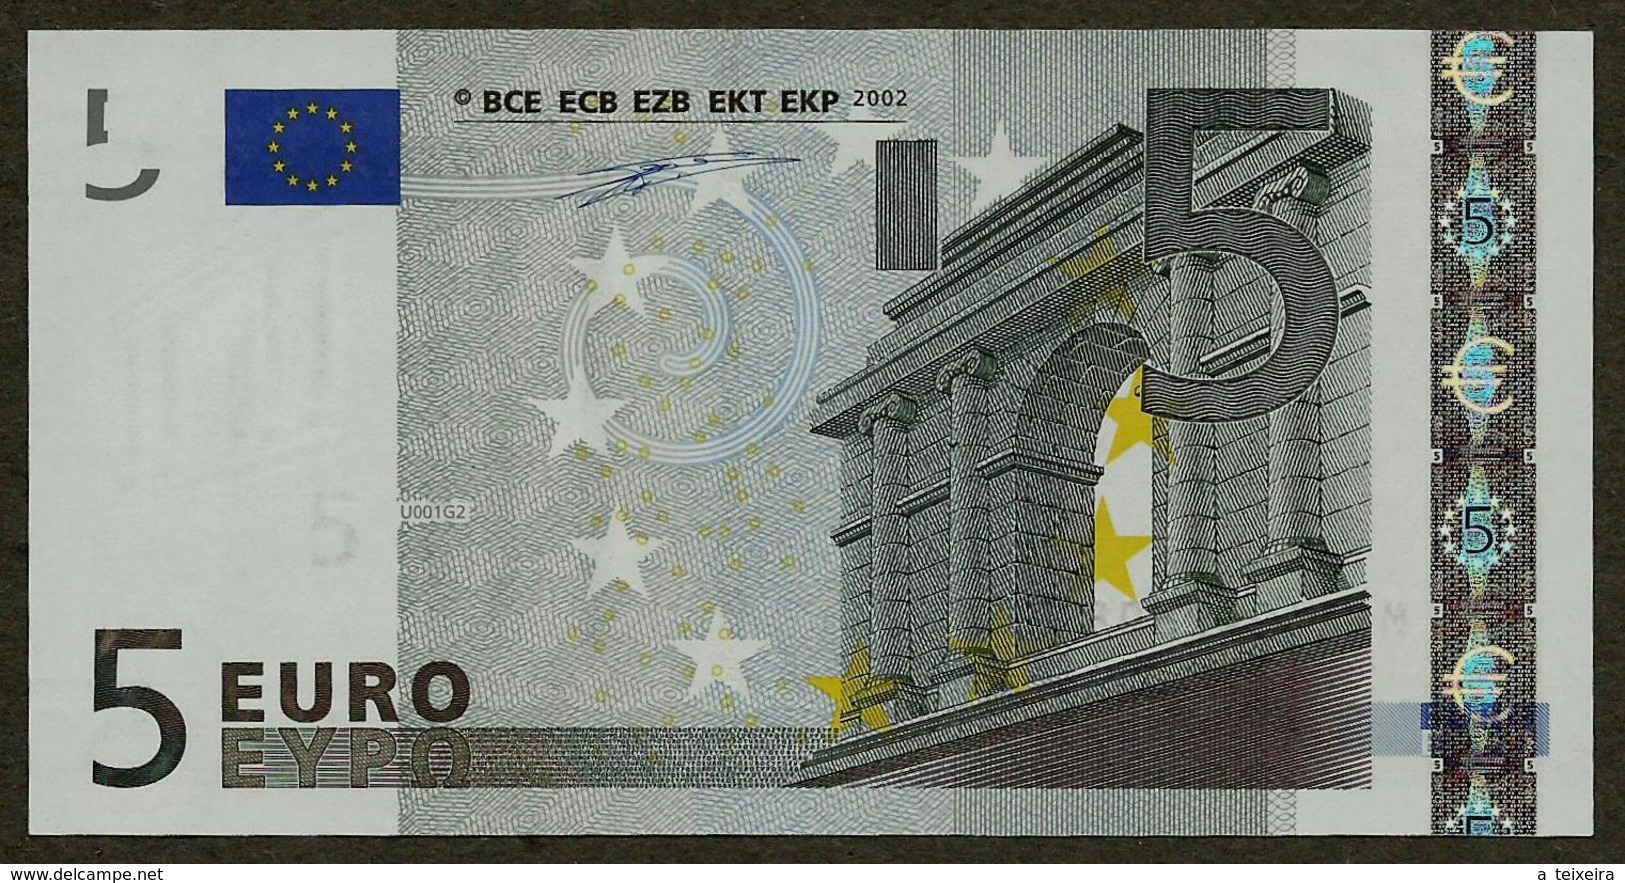 Portugal - 5 Euro - U001 G2 - M10494260896 - Duisenberg - UNC - EURO